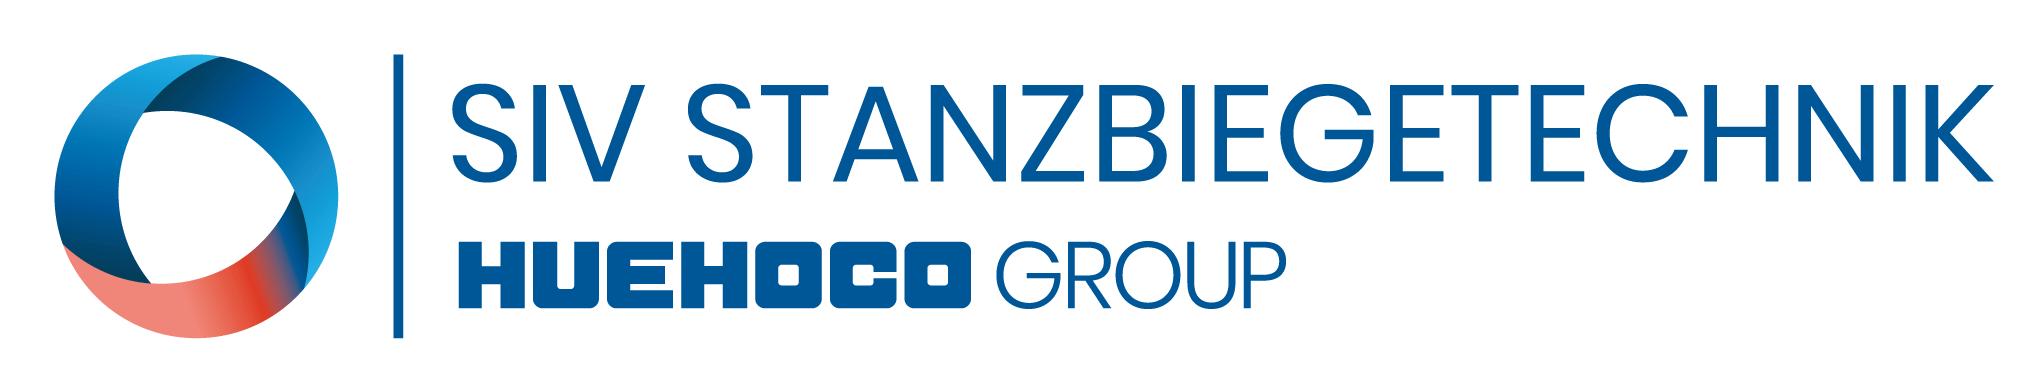 HUEHOCO GROUP Holding GmbH & Co._KG